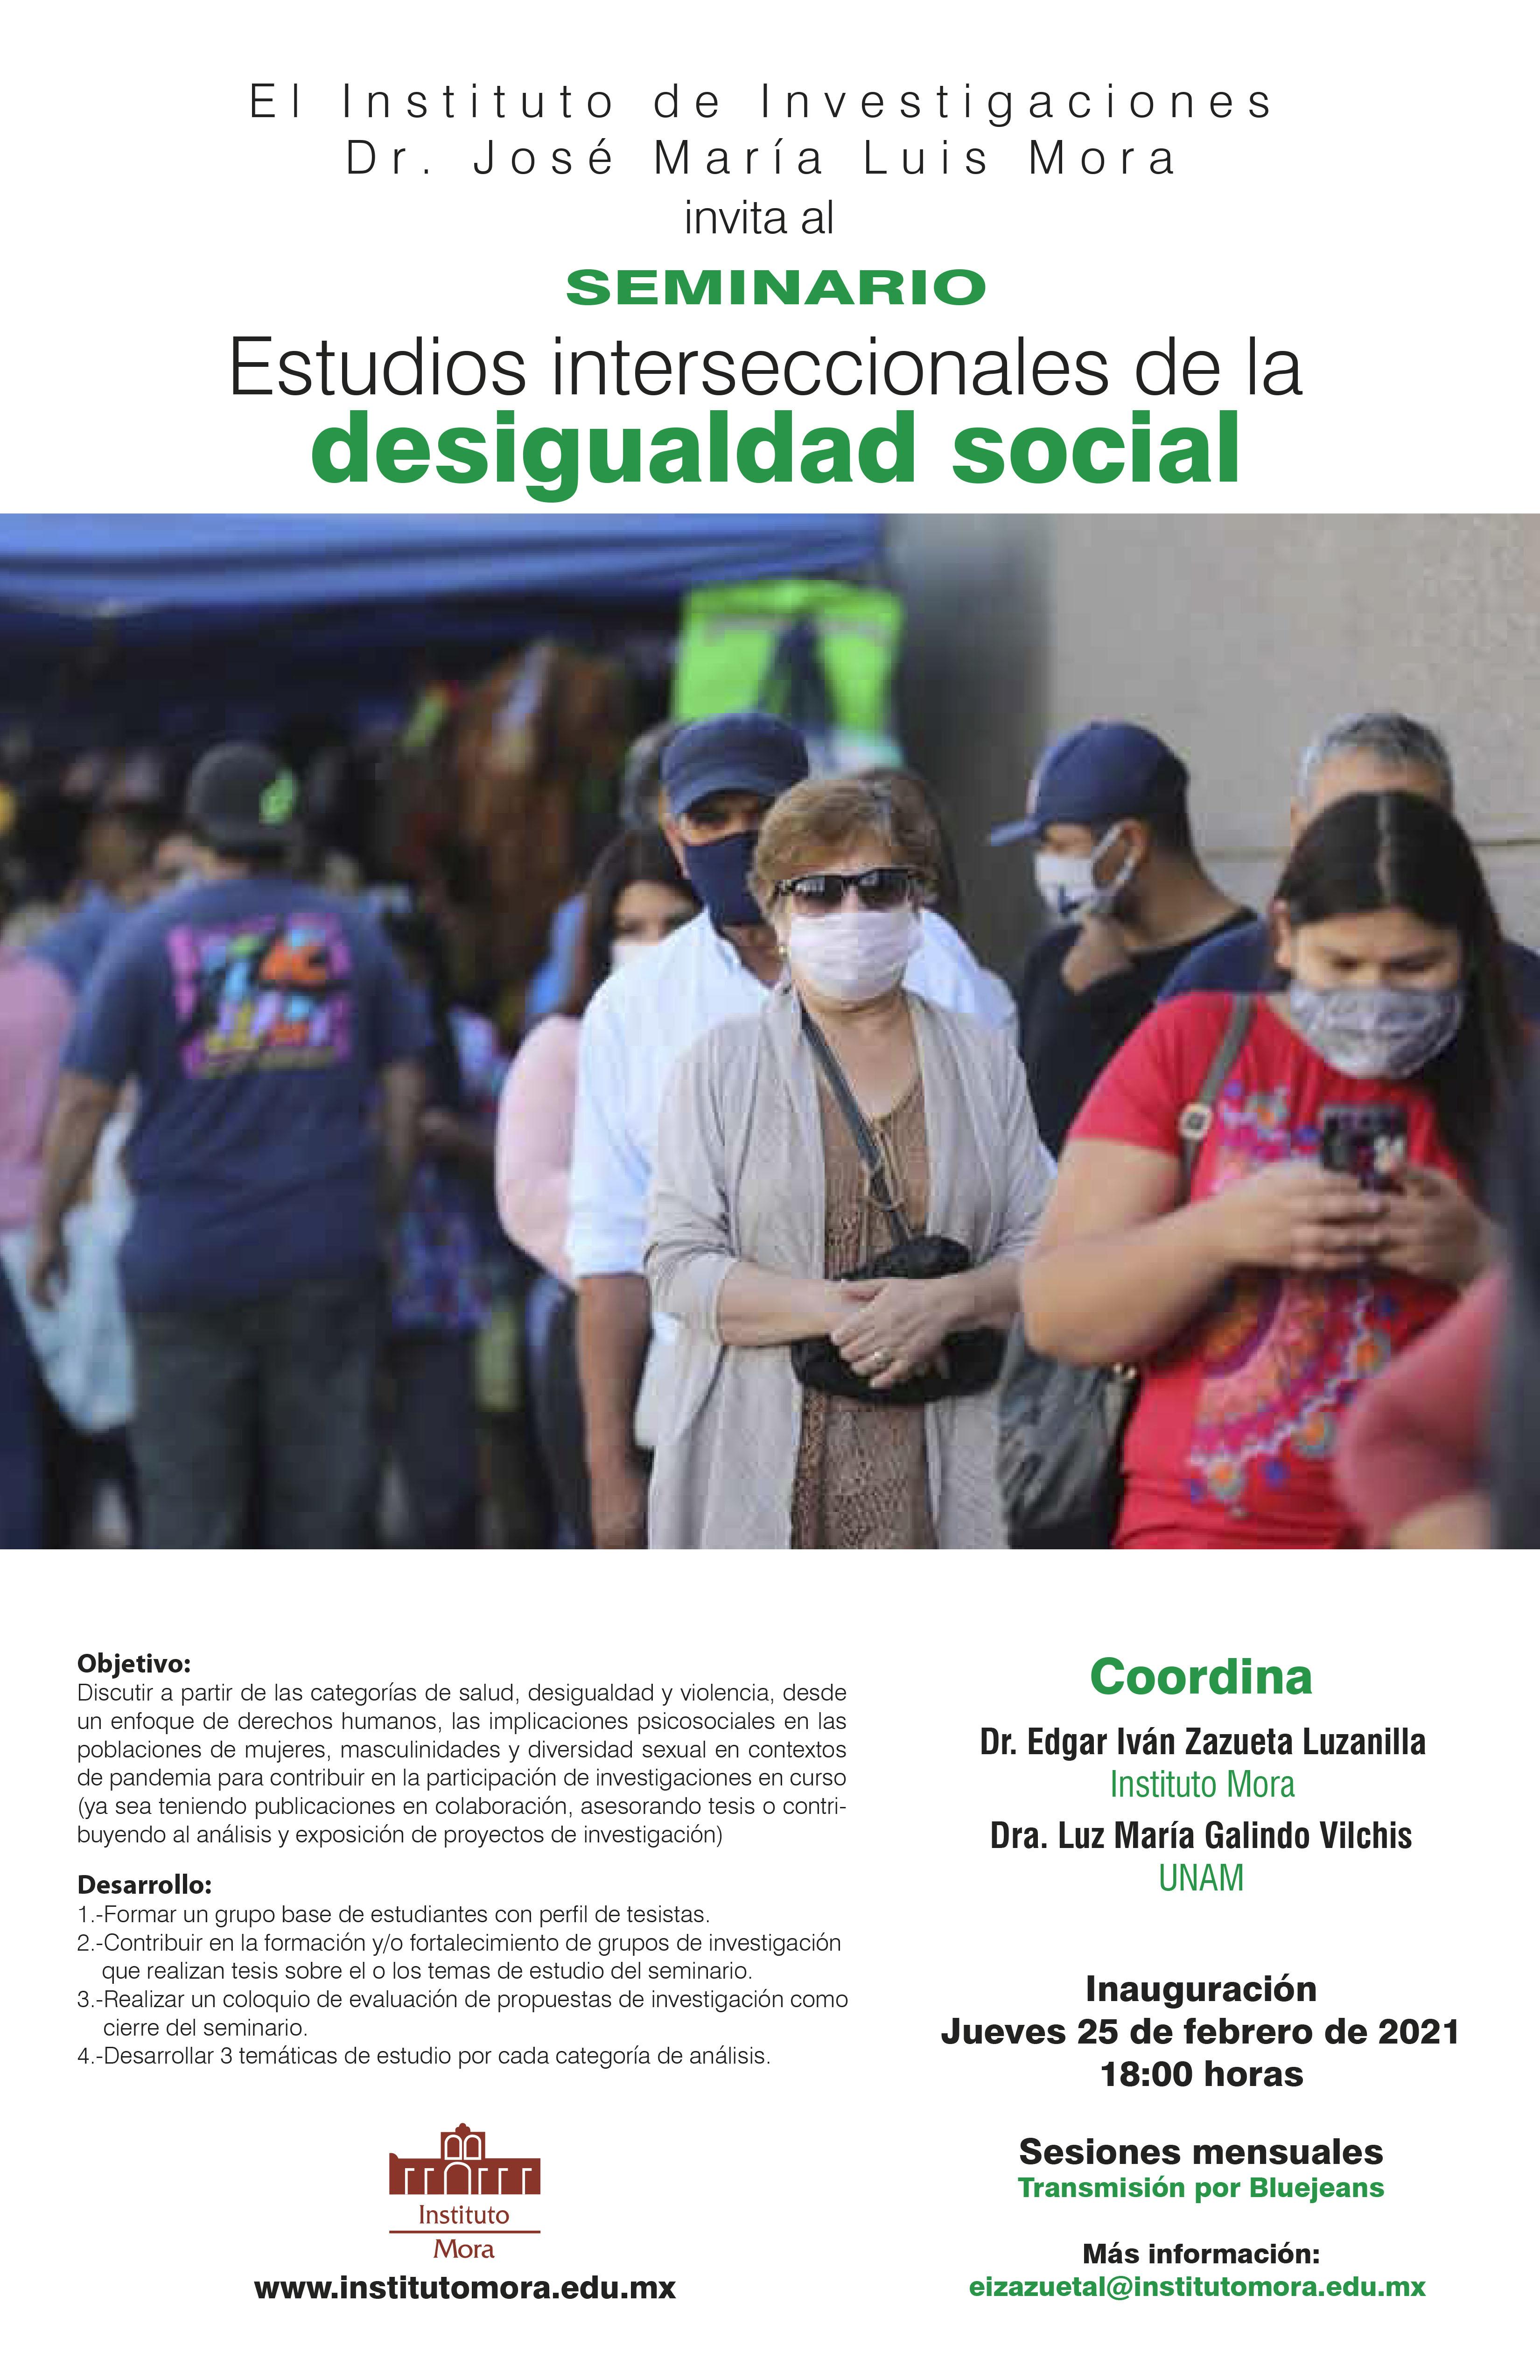 https://www.institutomora.edu.mx/Instituto/IE/1017_IESem25-022021.jpg